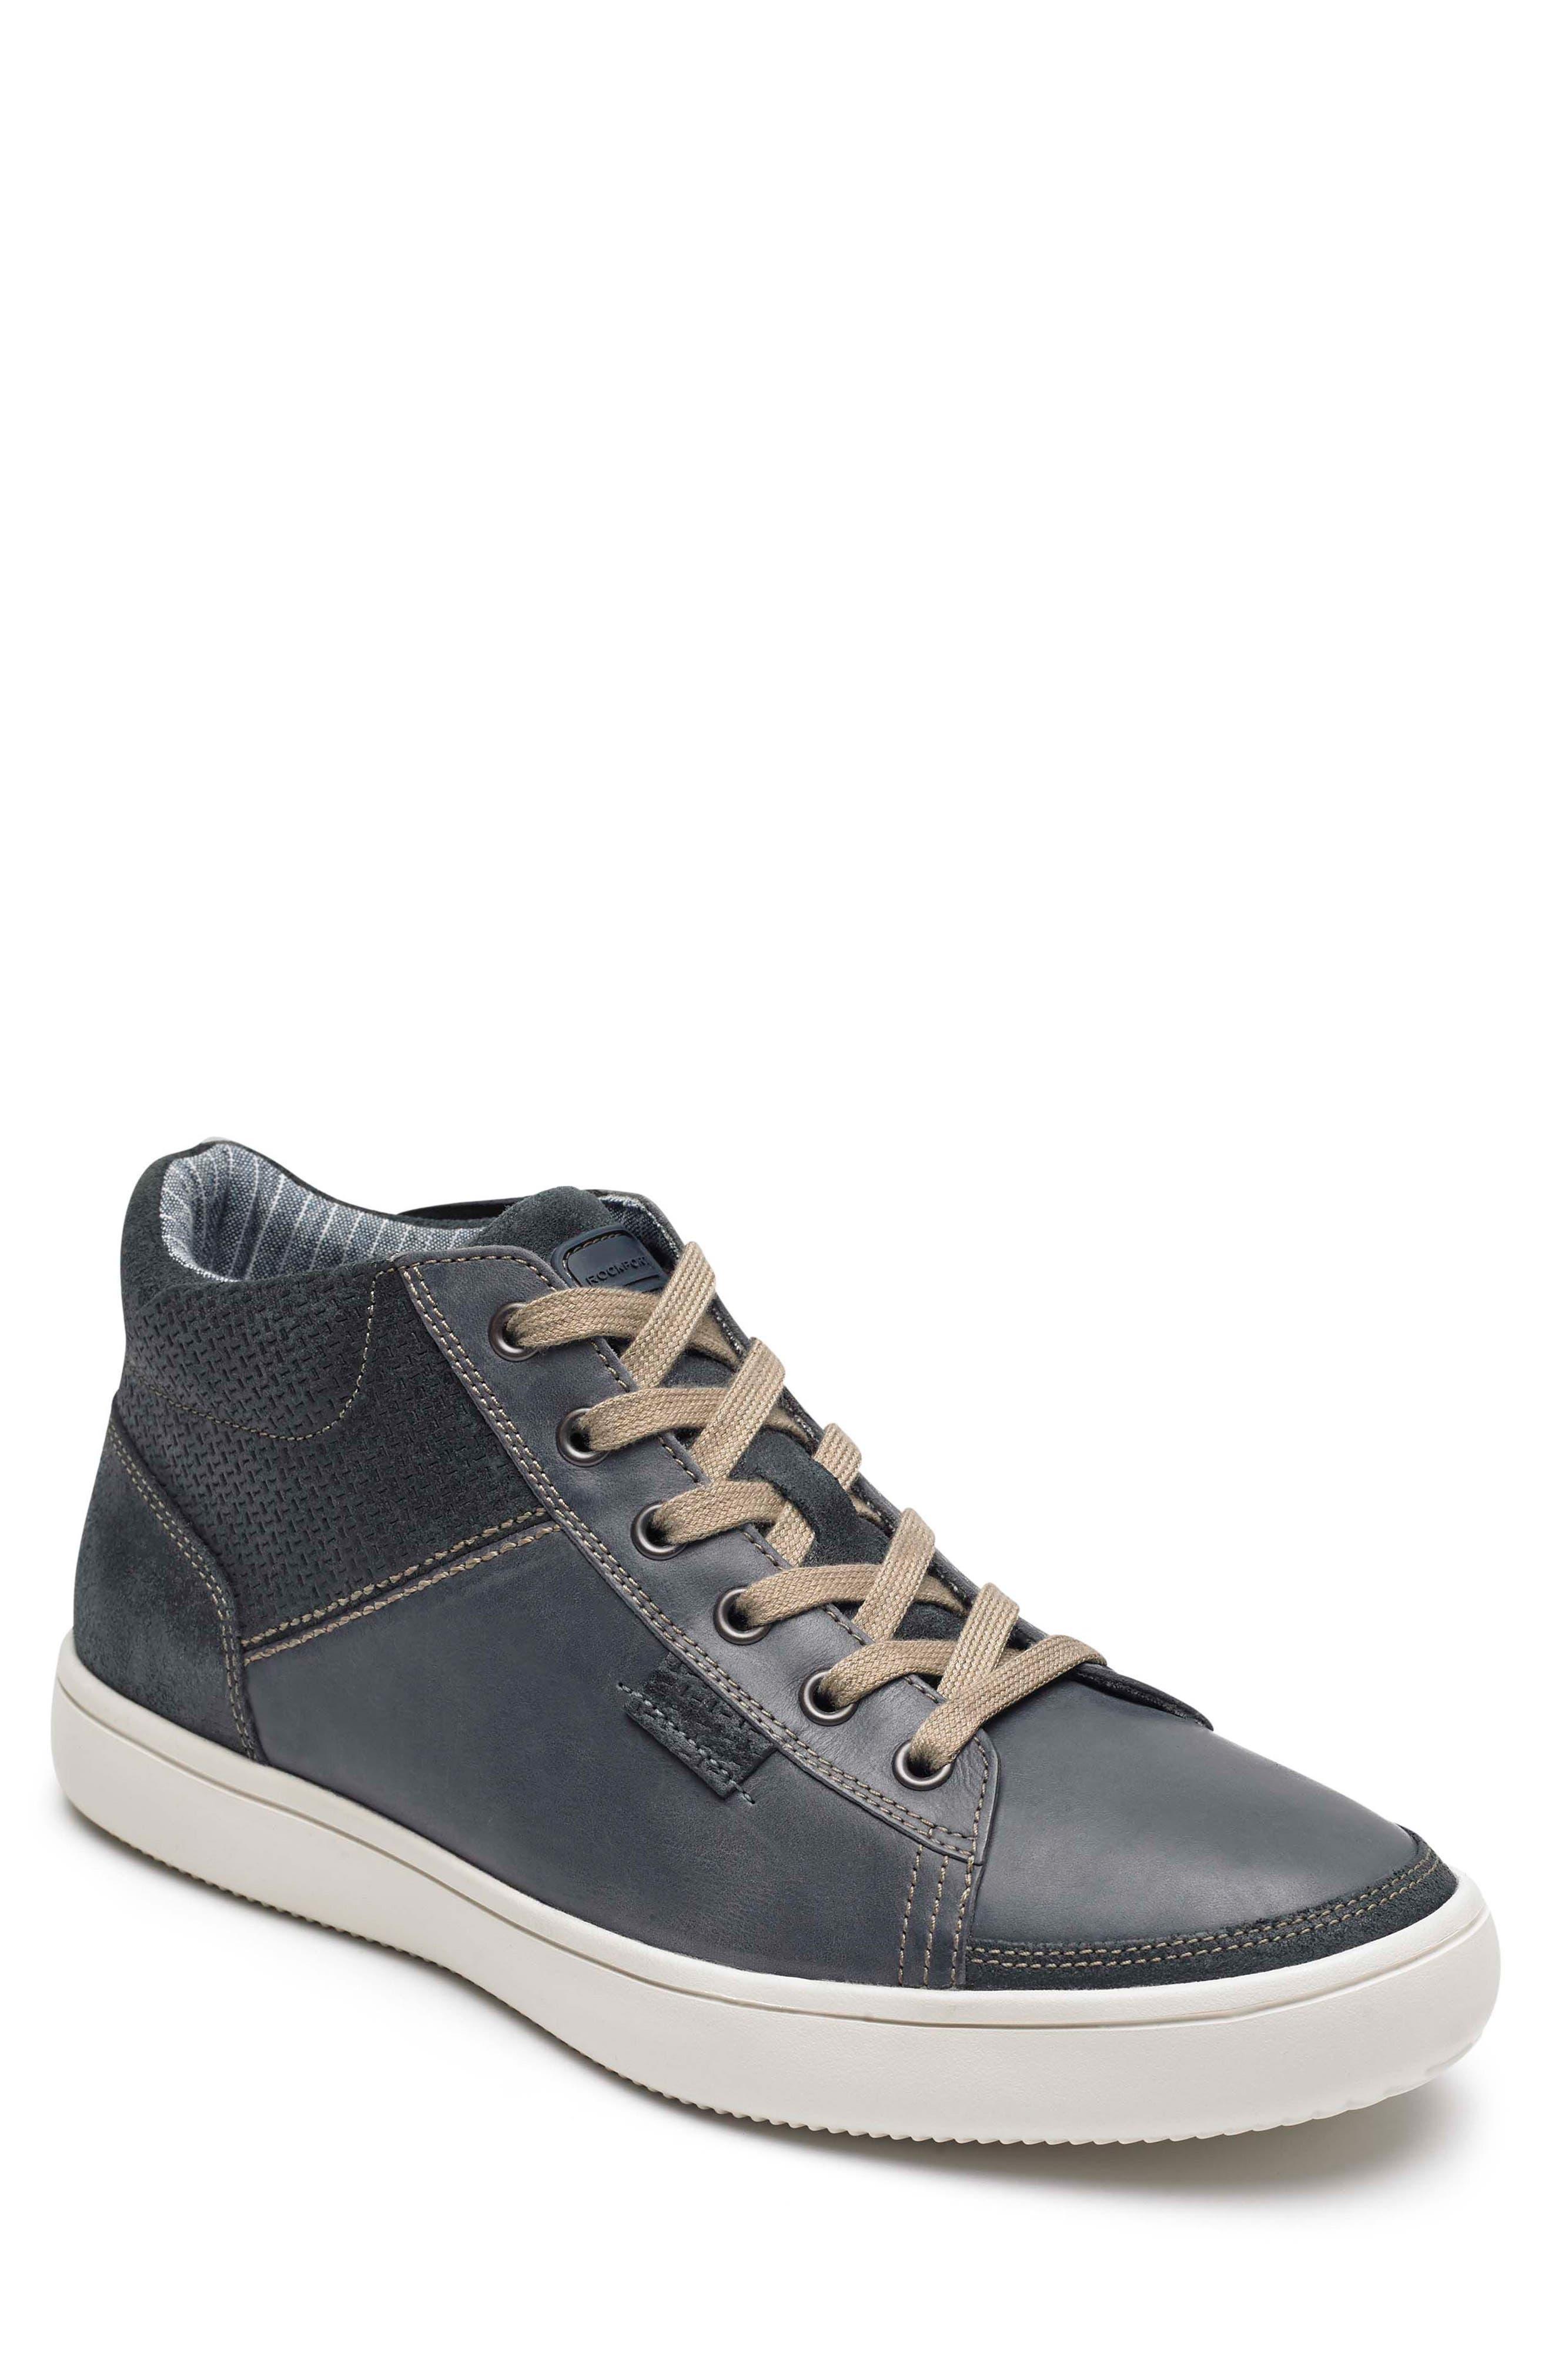 Main Image - Rockport Colle Sneaker (Men)